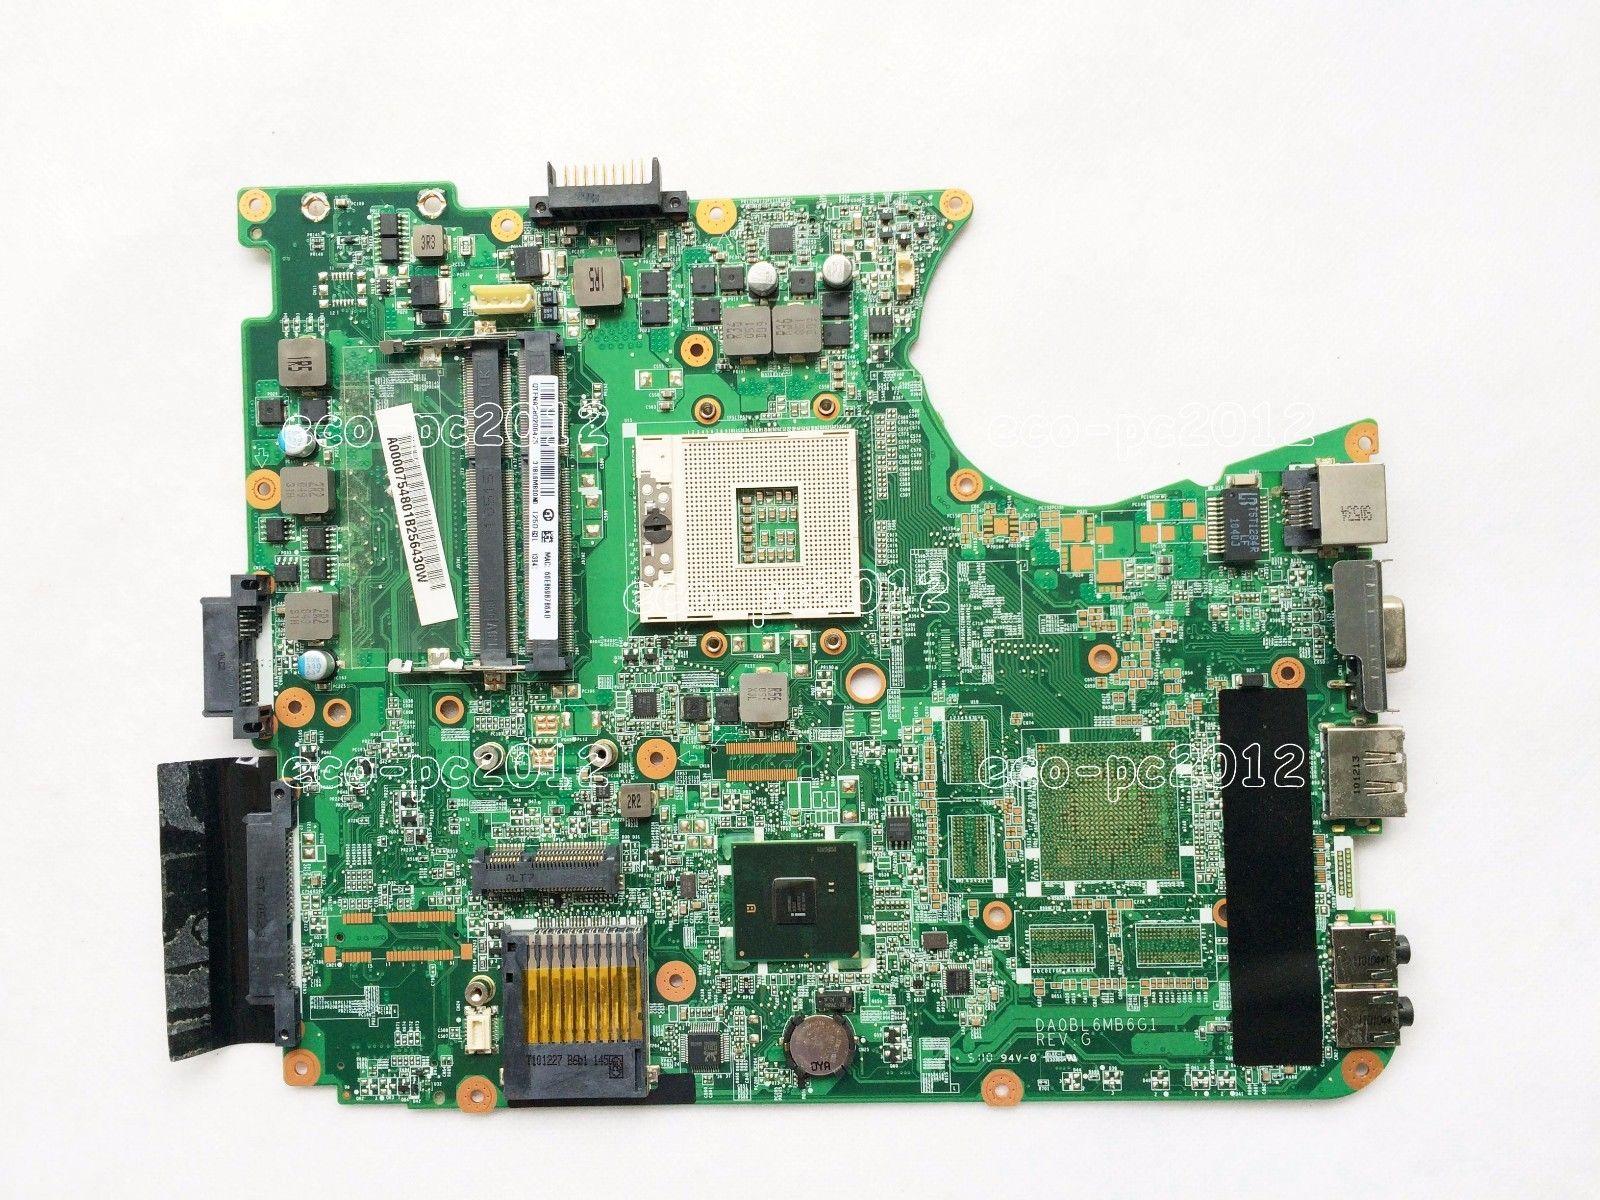 SHELI For Toshiba Satellite L655 L650 Laptop motherboard A000075480 hm55 ddr3 31BL6MB0010 DA0BL6MB6F0 integrated graphics card